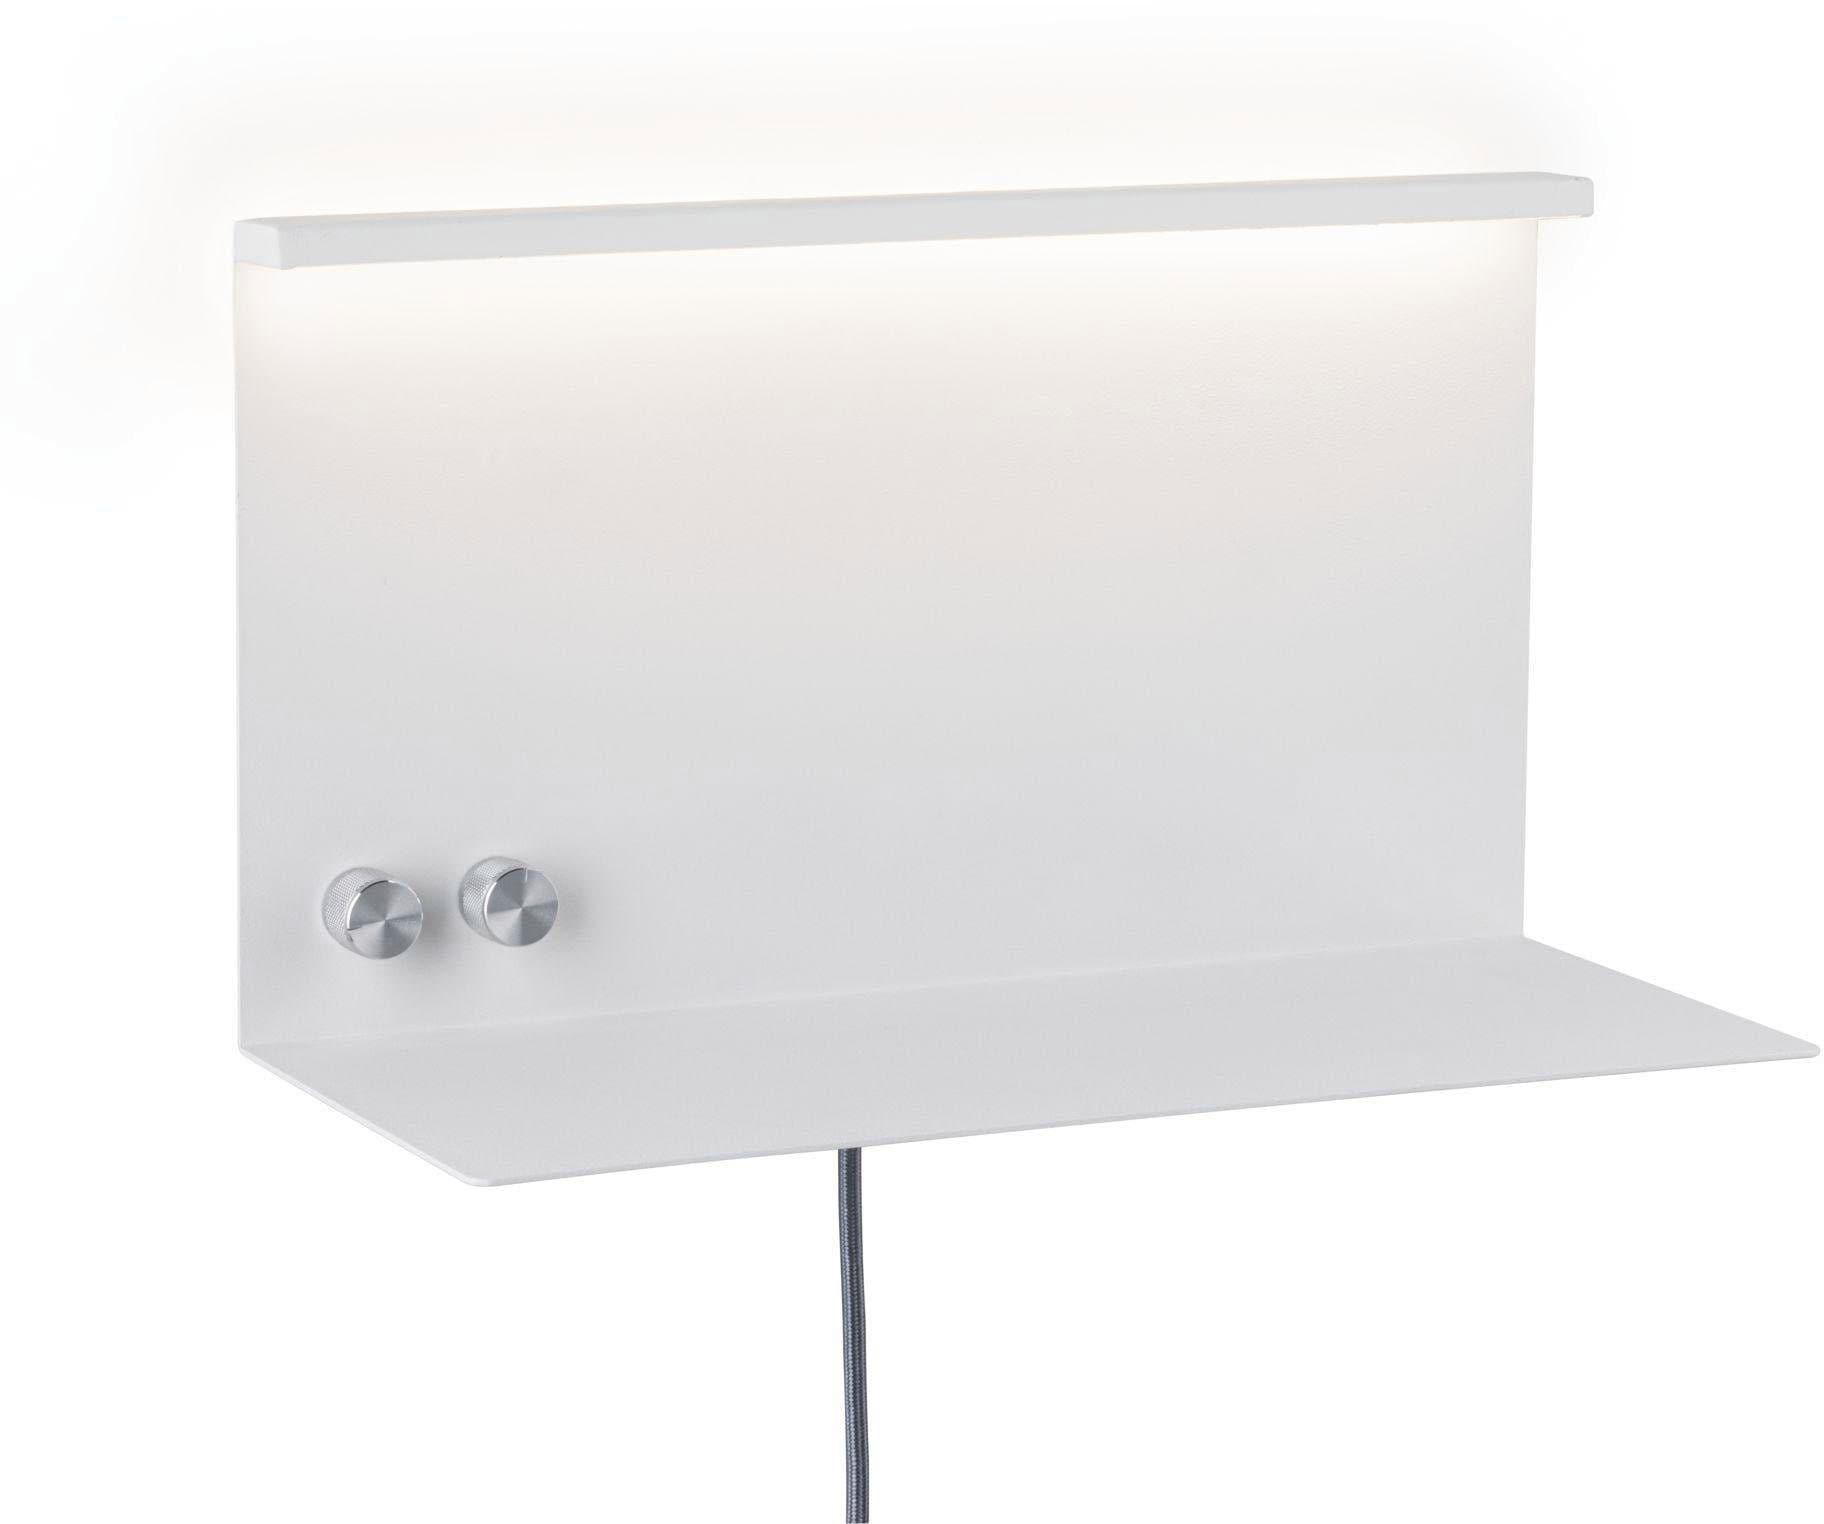 Paulmann LED Wandleuchte Jarina mit Ablage 4,5 W/ 1,6 W